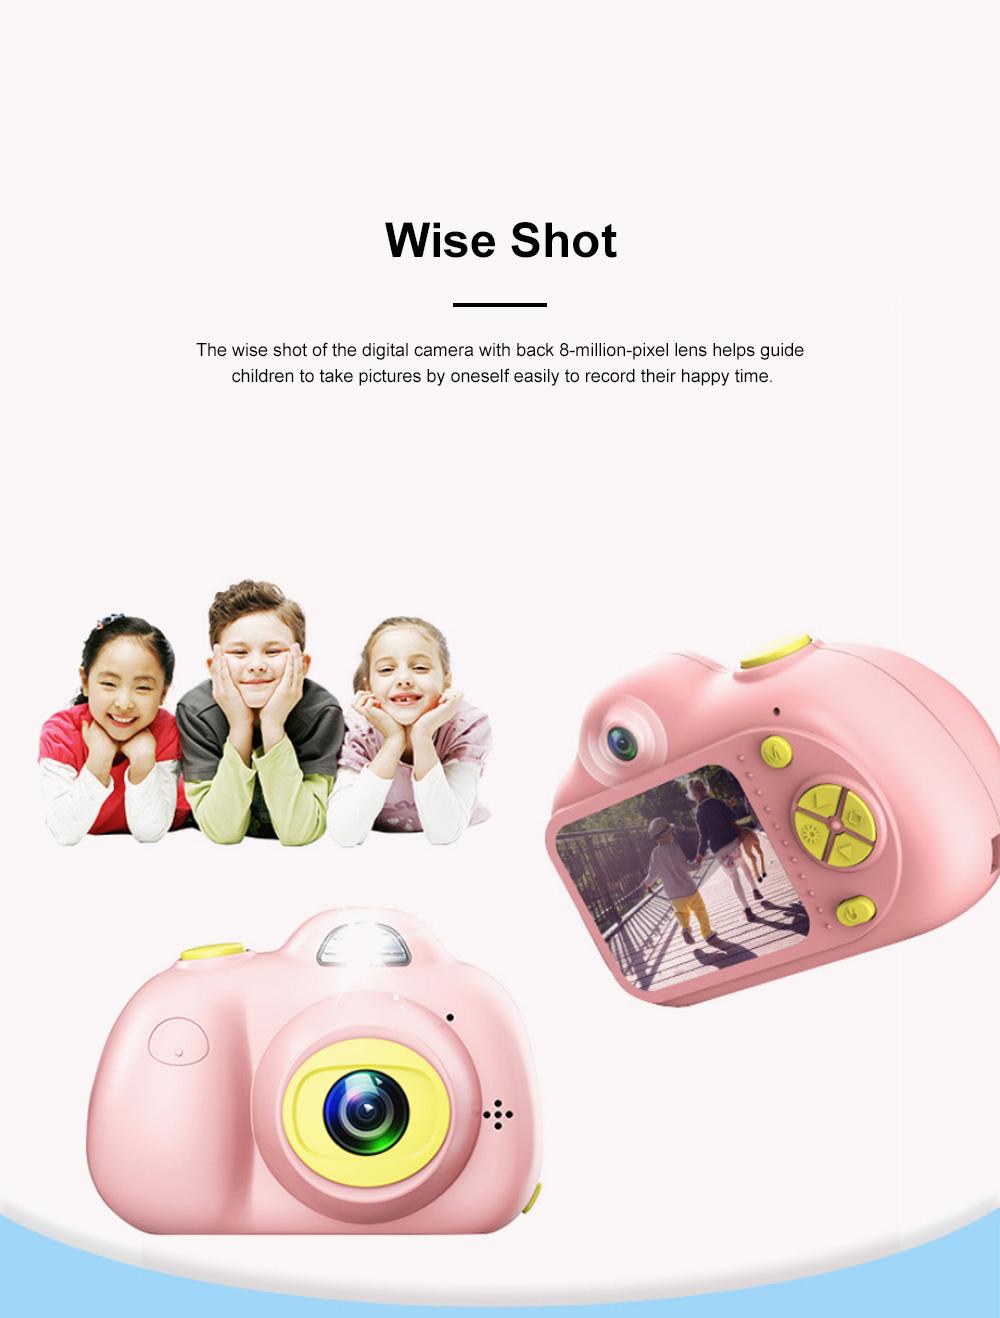 Children Digital Single Lens Reflex Creative Gift Household Use Broken-resistant Twin Lens Toy Camera Mini Funny Kids Digital Camera 1